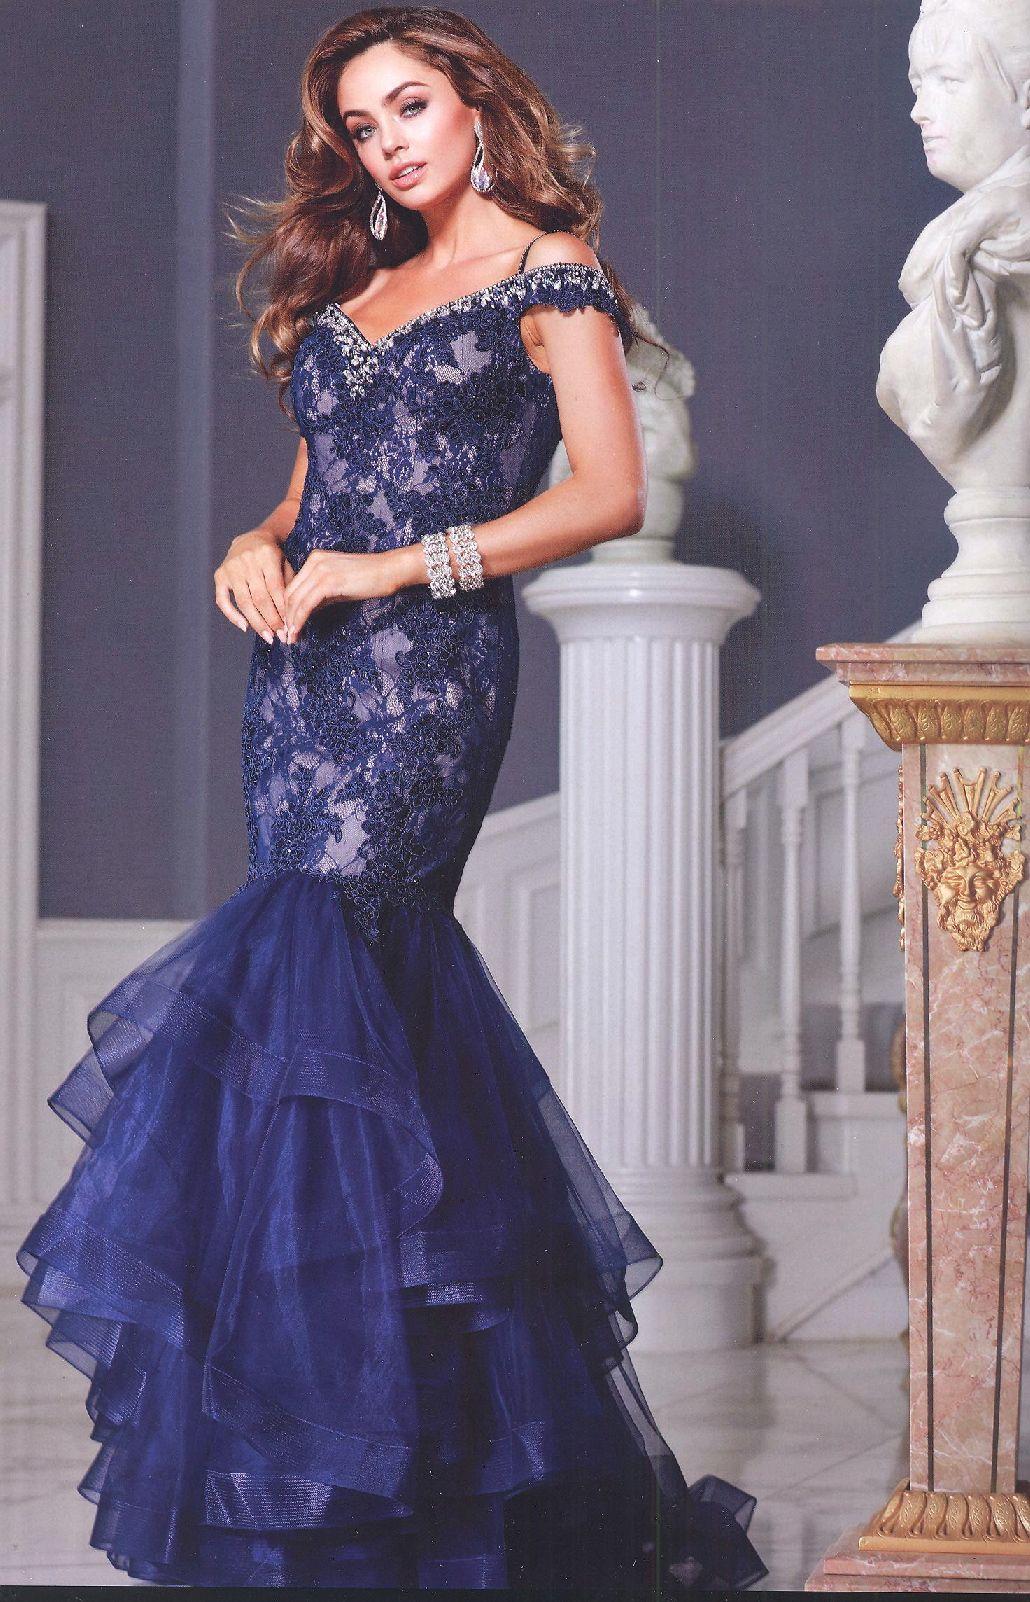 Prom dresses evening dresses by anabelucbrueanaeucbrueoff shoulder